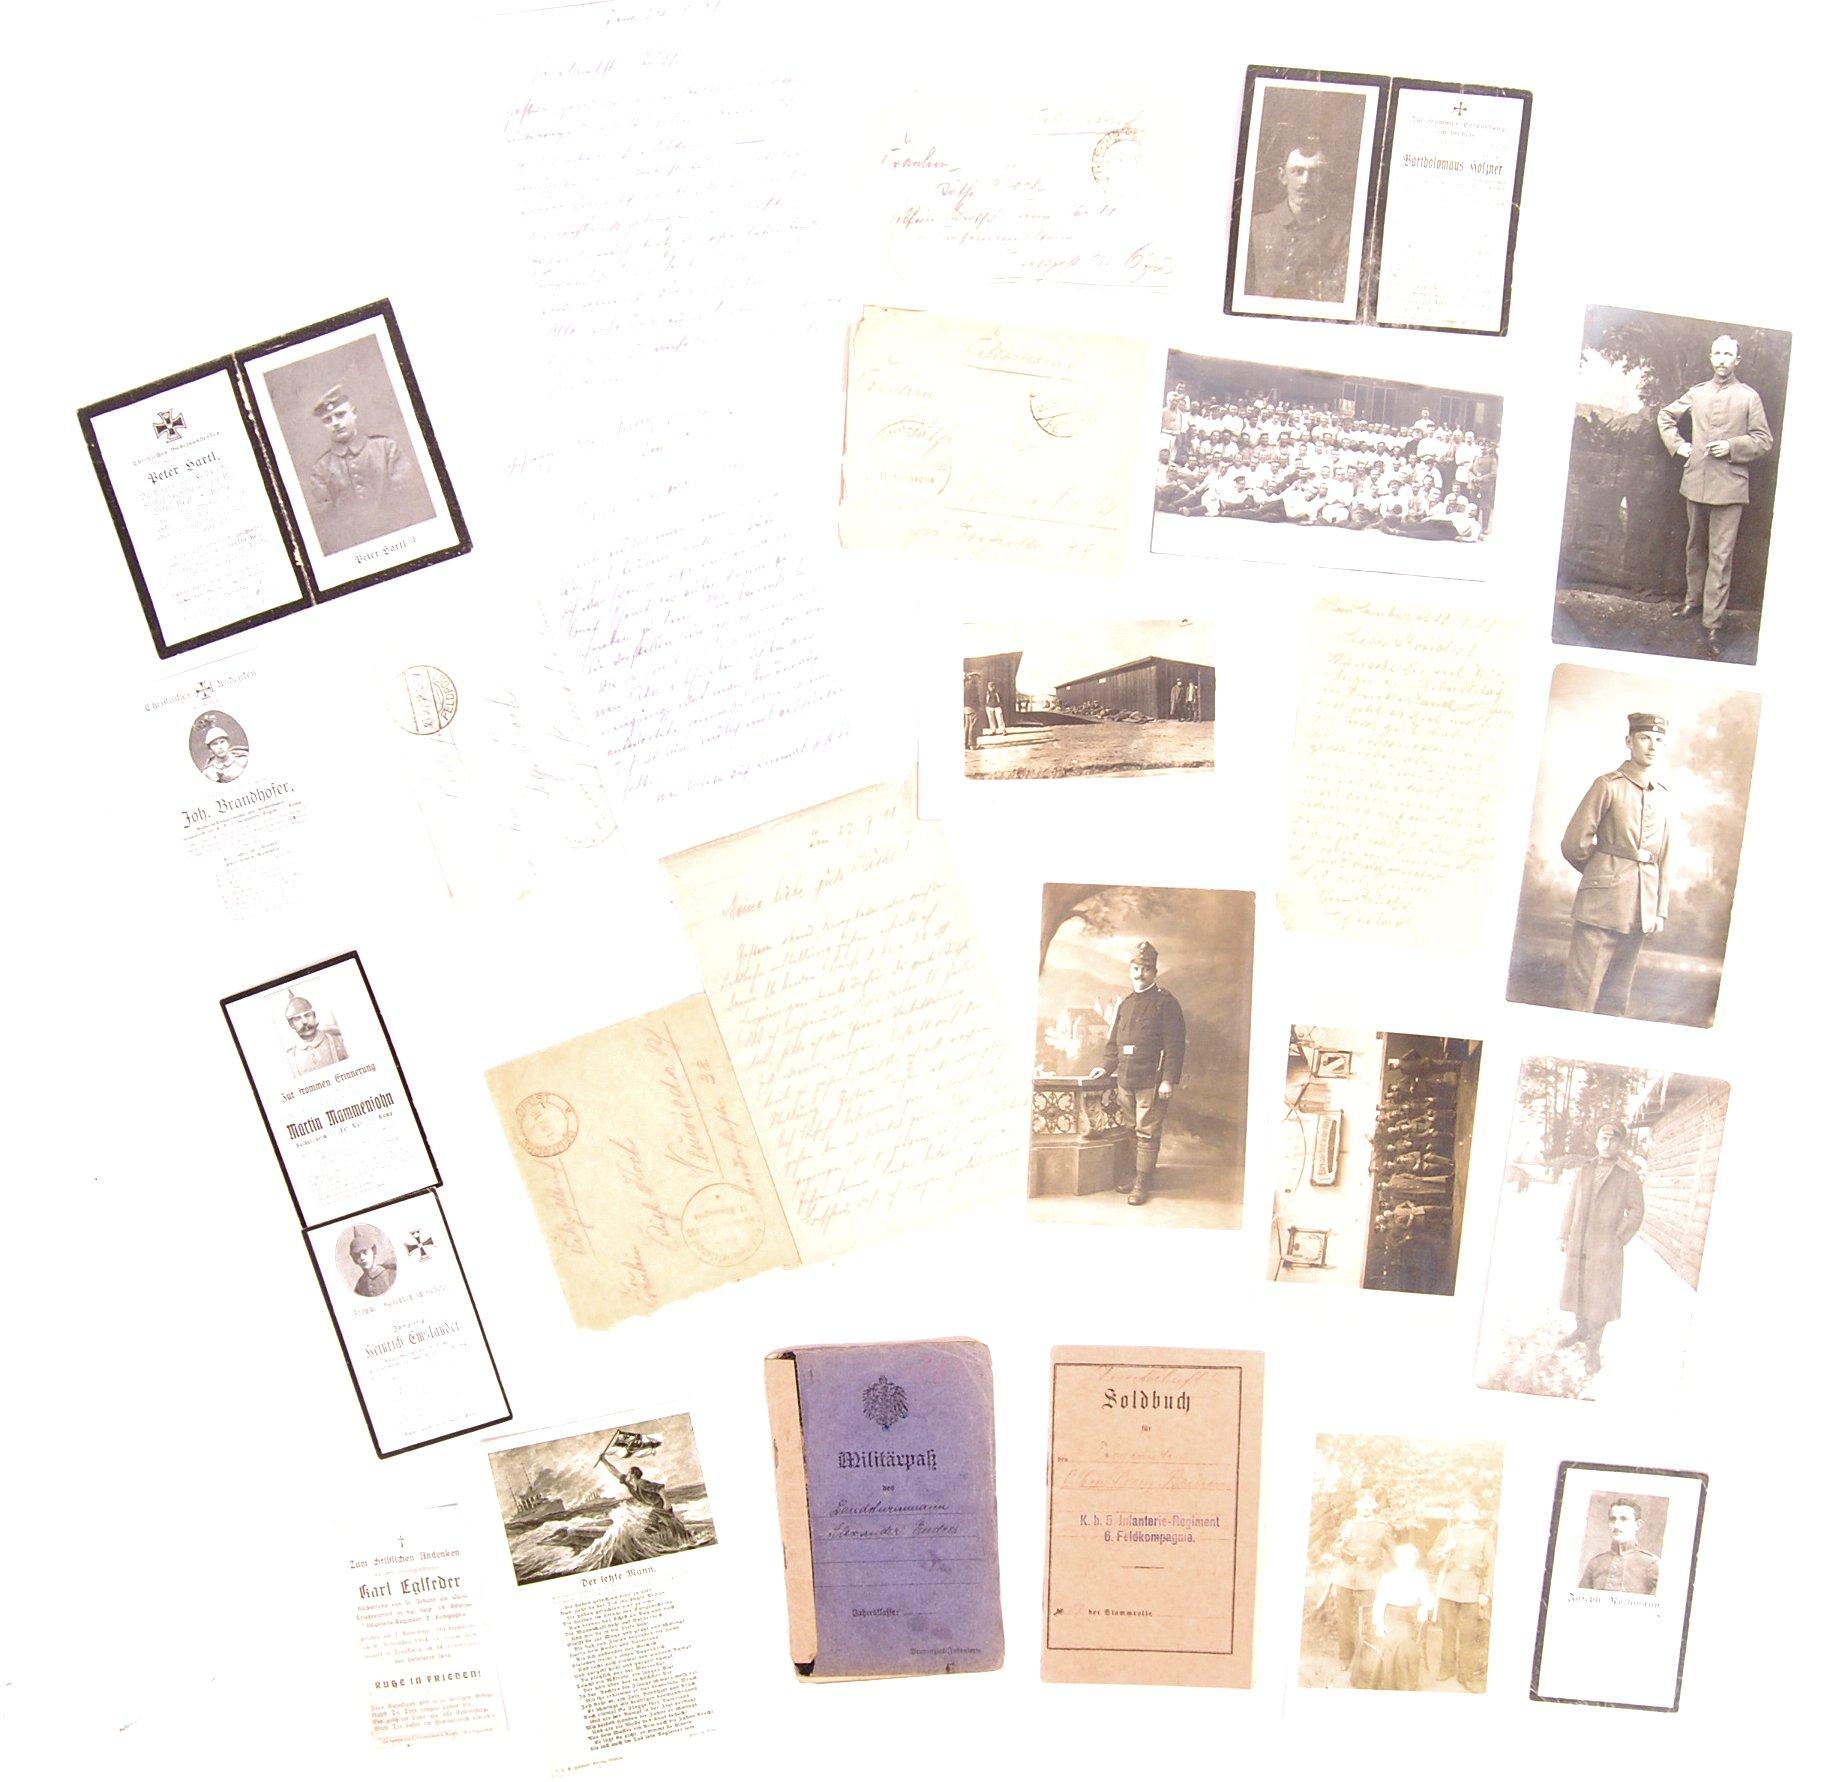 Lot 115 - COLLECTION OF WWI FIRST WORLD WAR GERMAN EPHEMERA